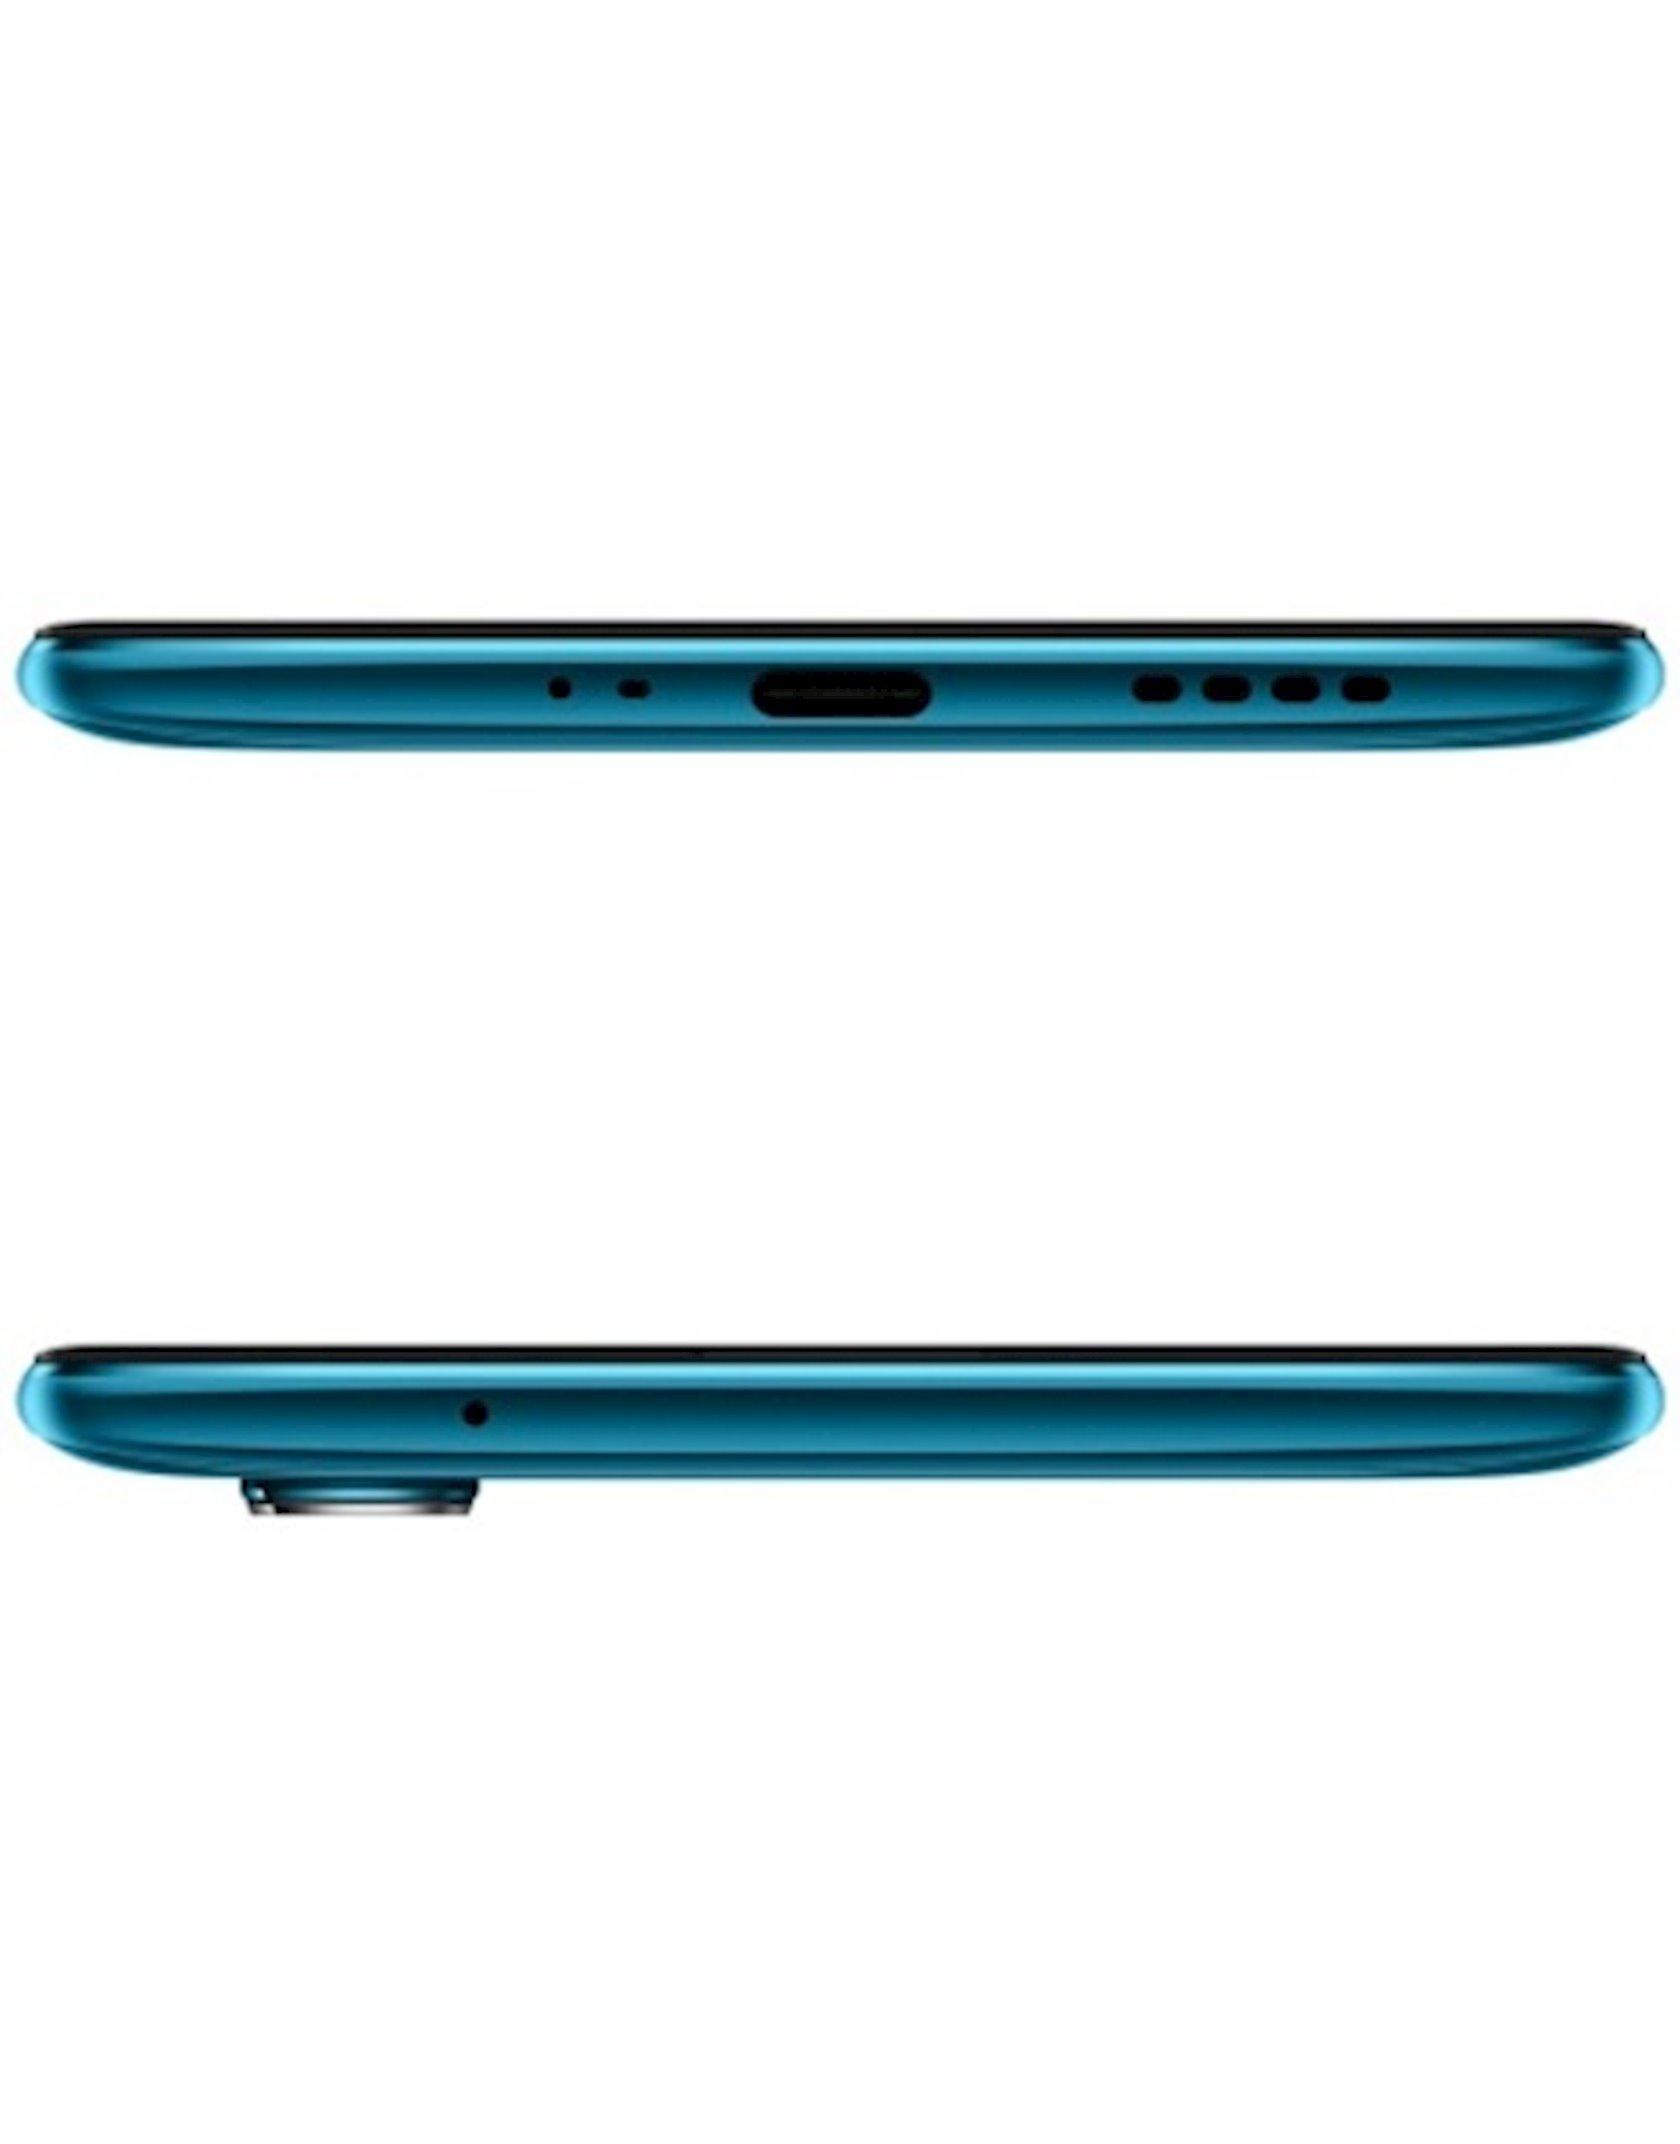 Smartfon Realme X3 8GB/128 GB Blue